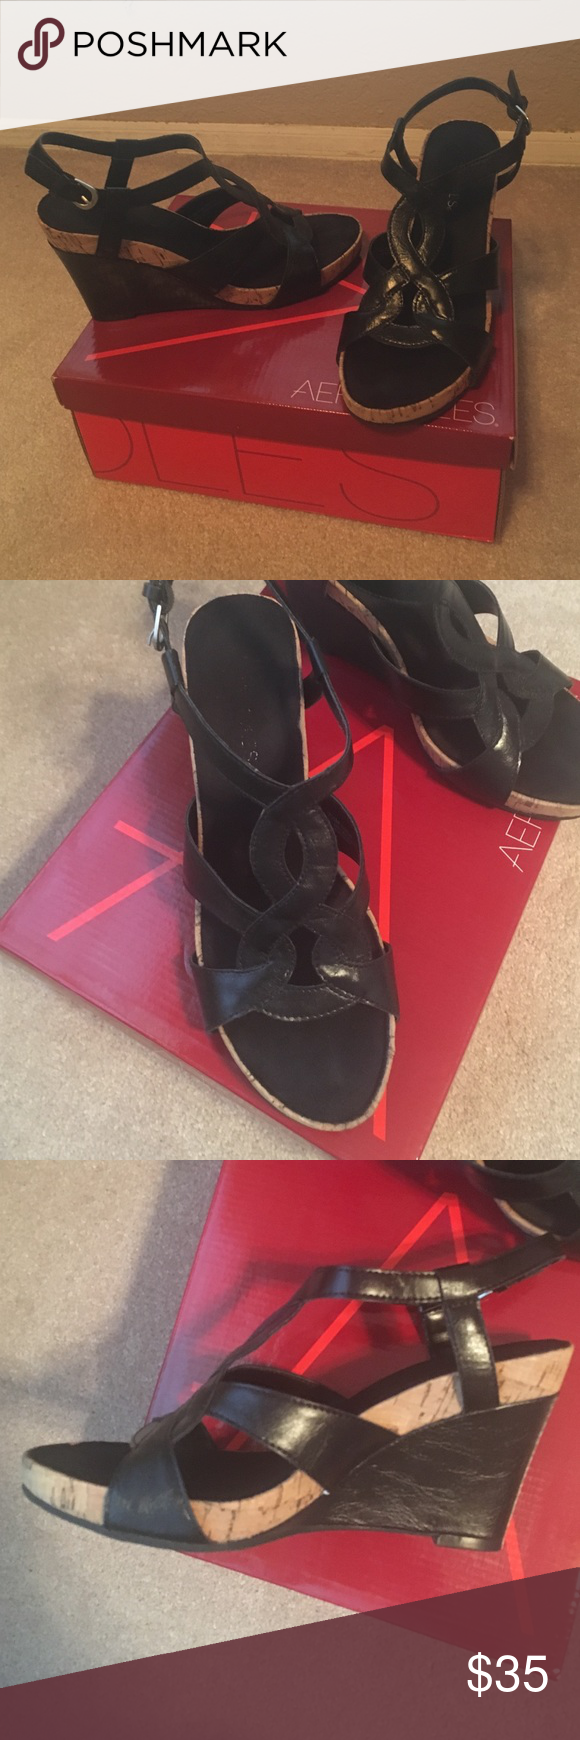 Black sandals size 7 - Aerosols Black Sandals Size 7 1 2 Memory Foam Comfort Wedge Sandals Aerosoles Shoes Wedges